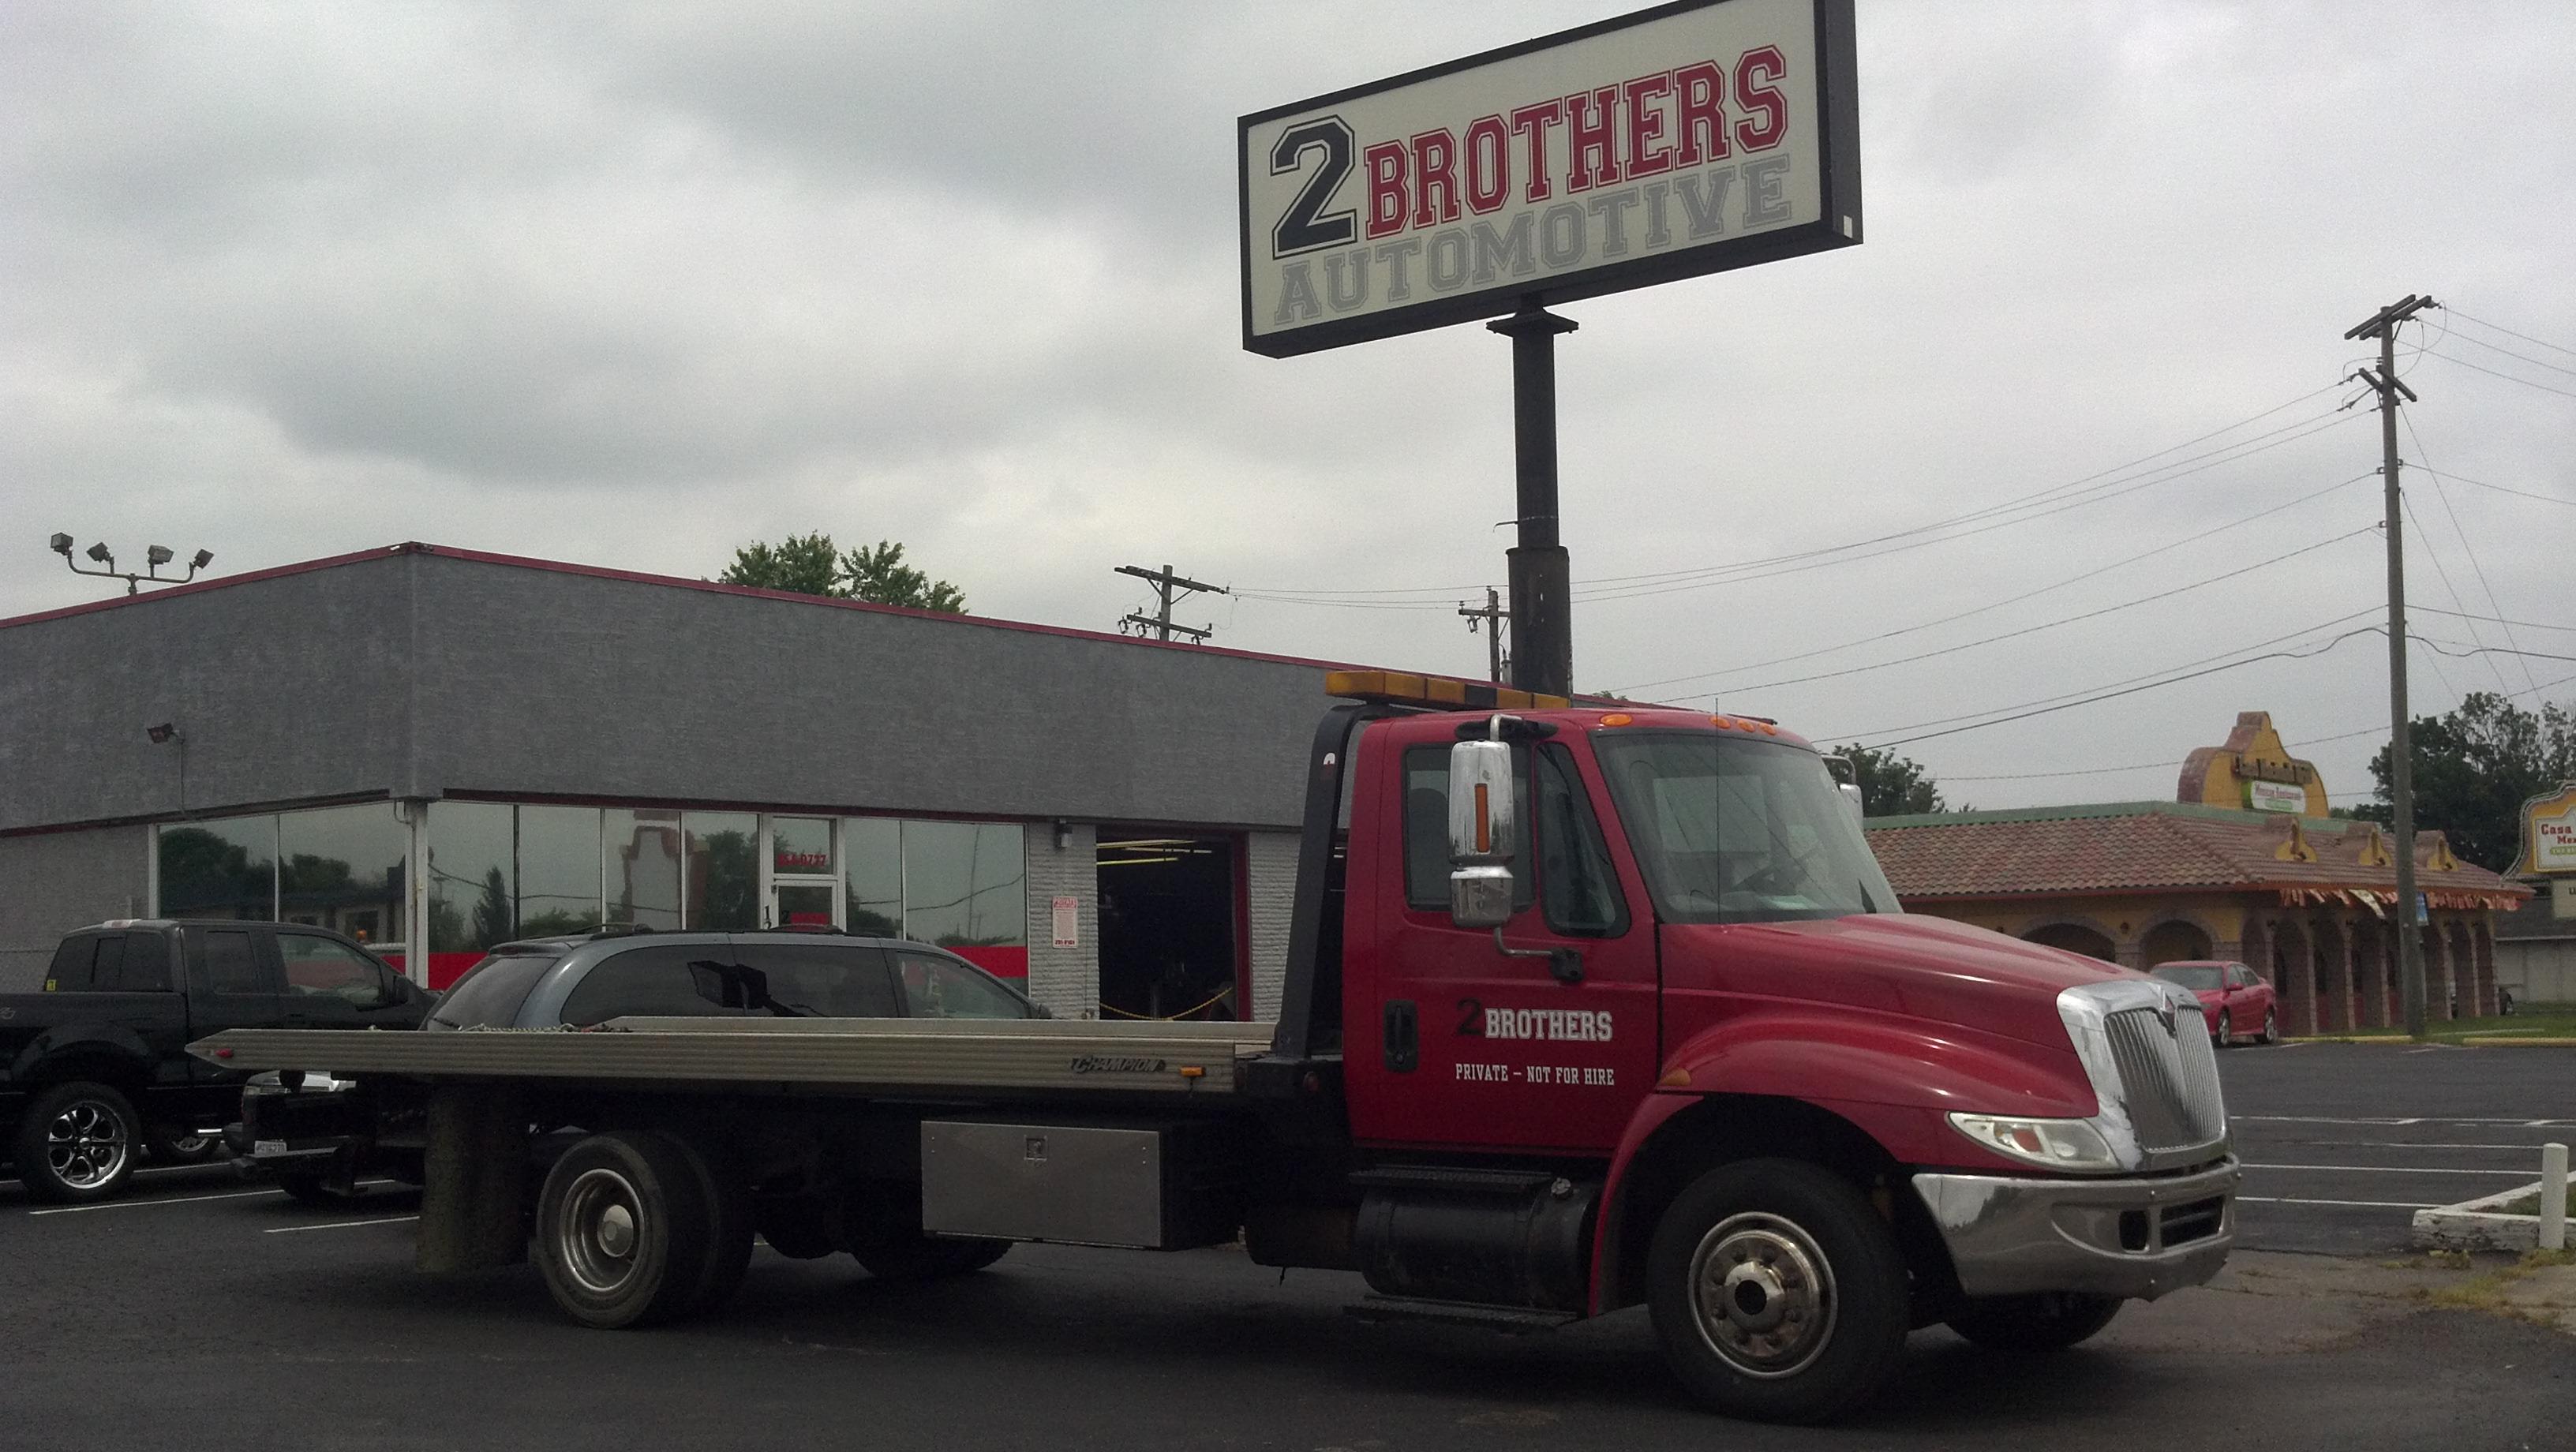 2 Brothers Automotive